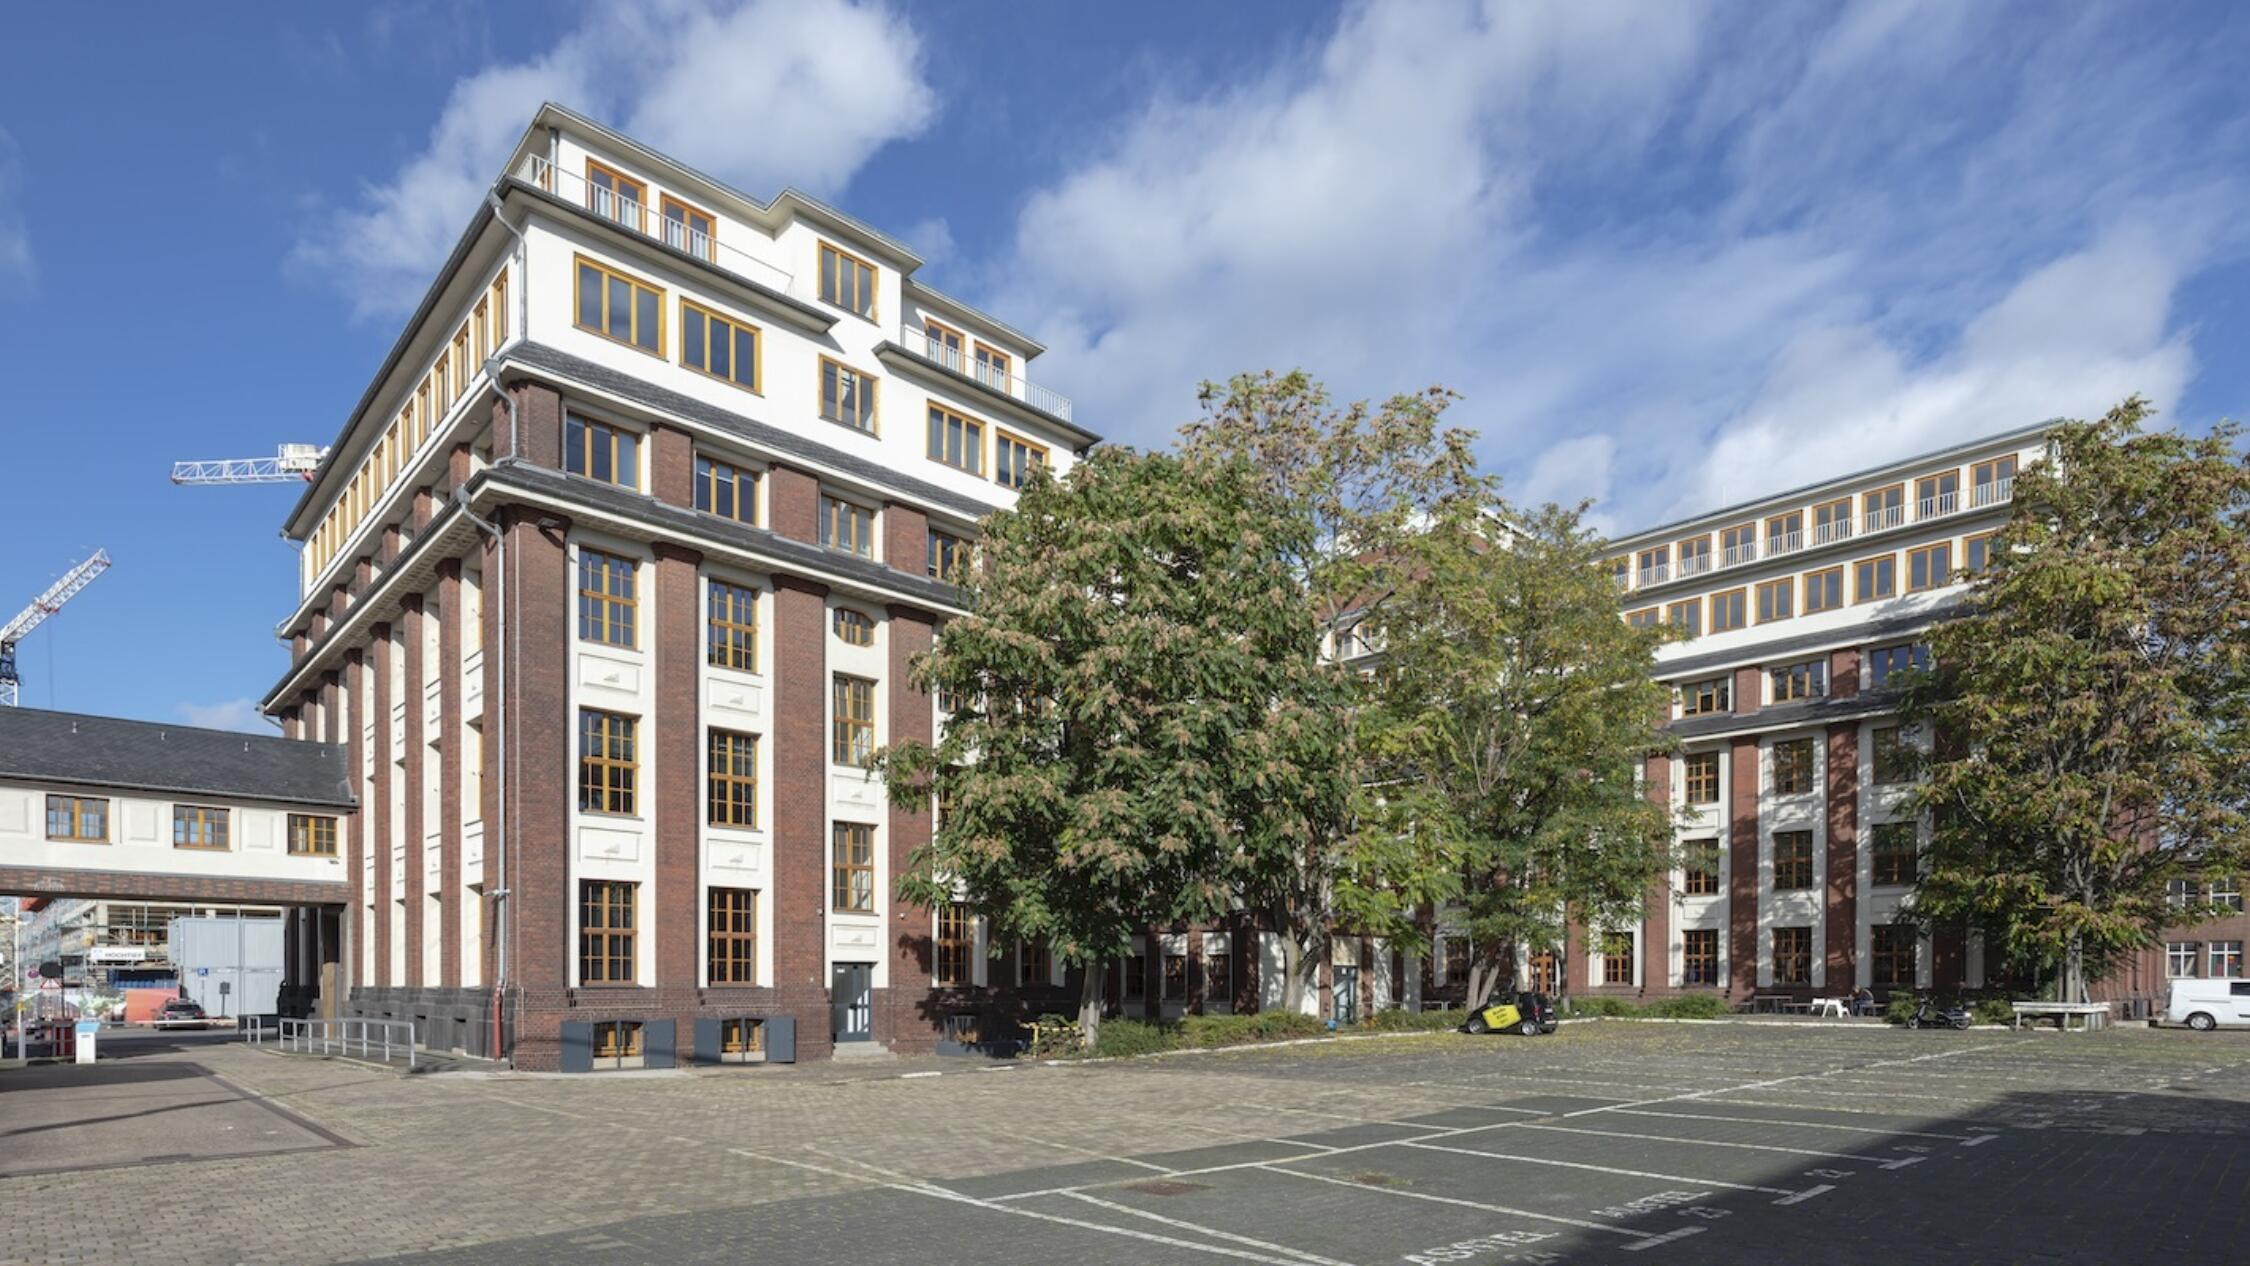 Schanzenstrasse facade with parking lot in foreground lot